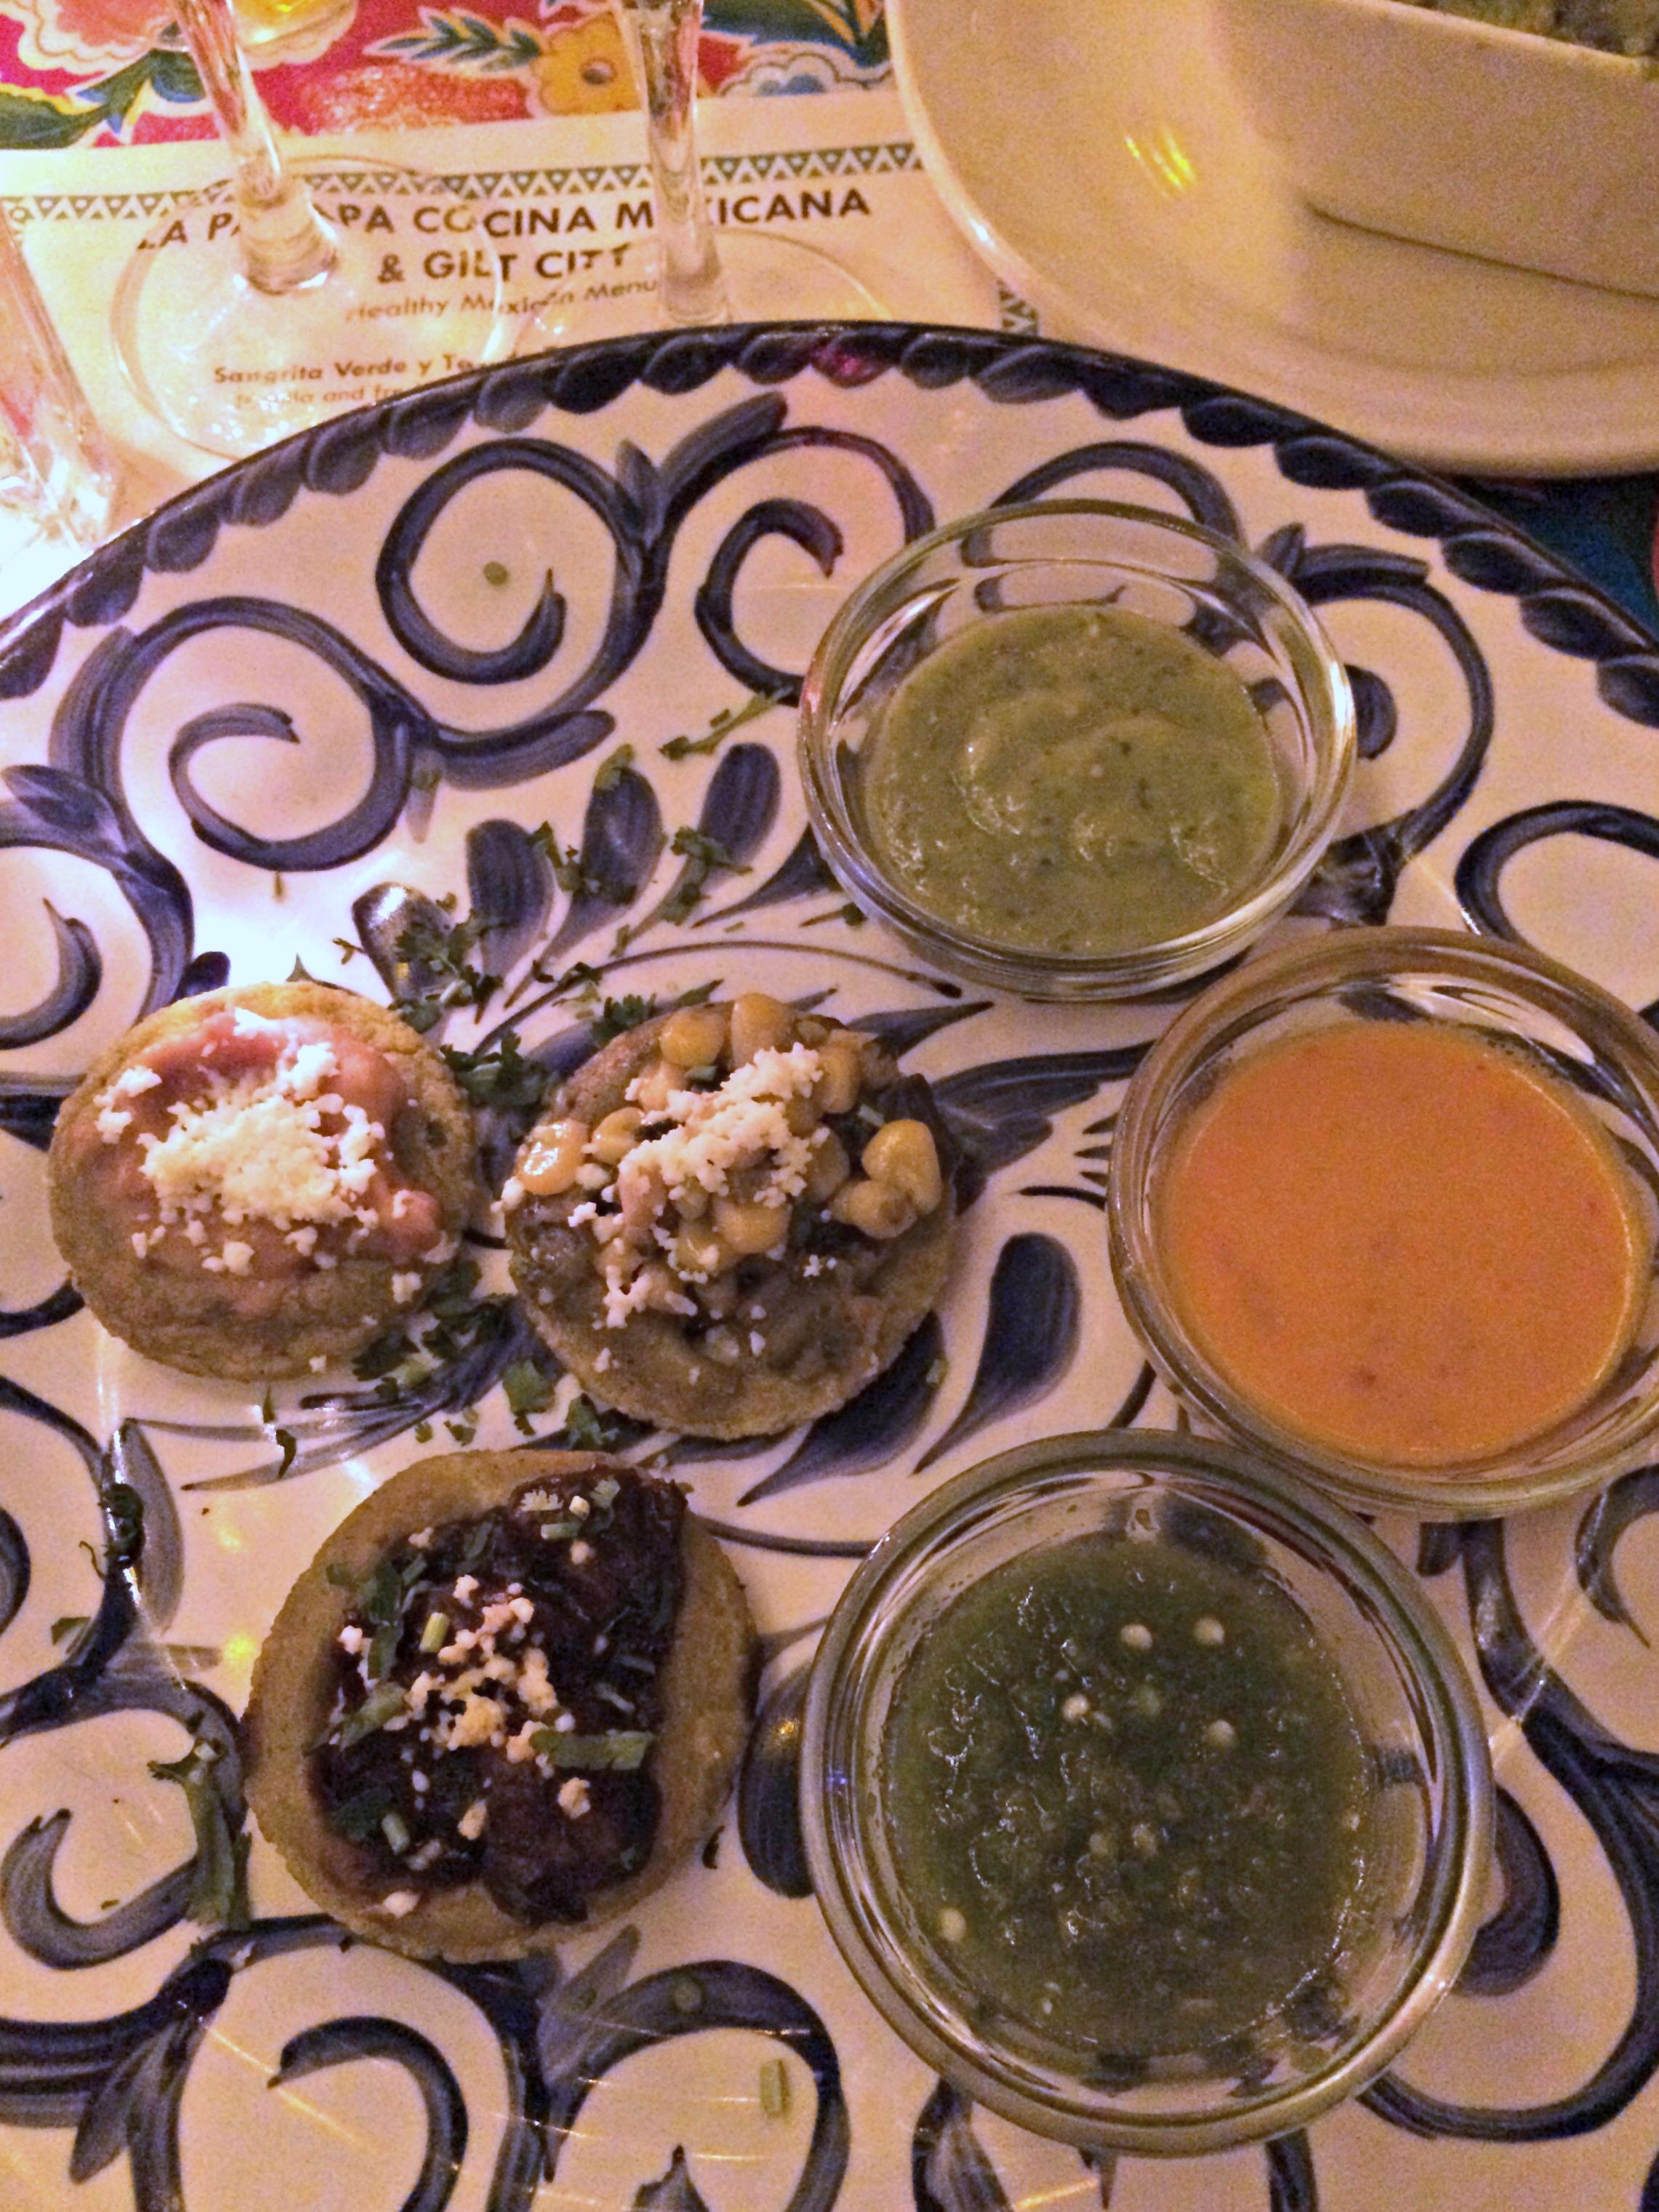 La Palapa Cocina Mexicana chalupas